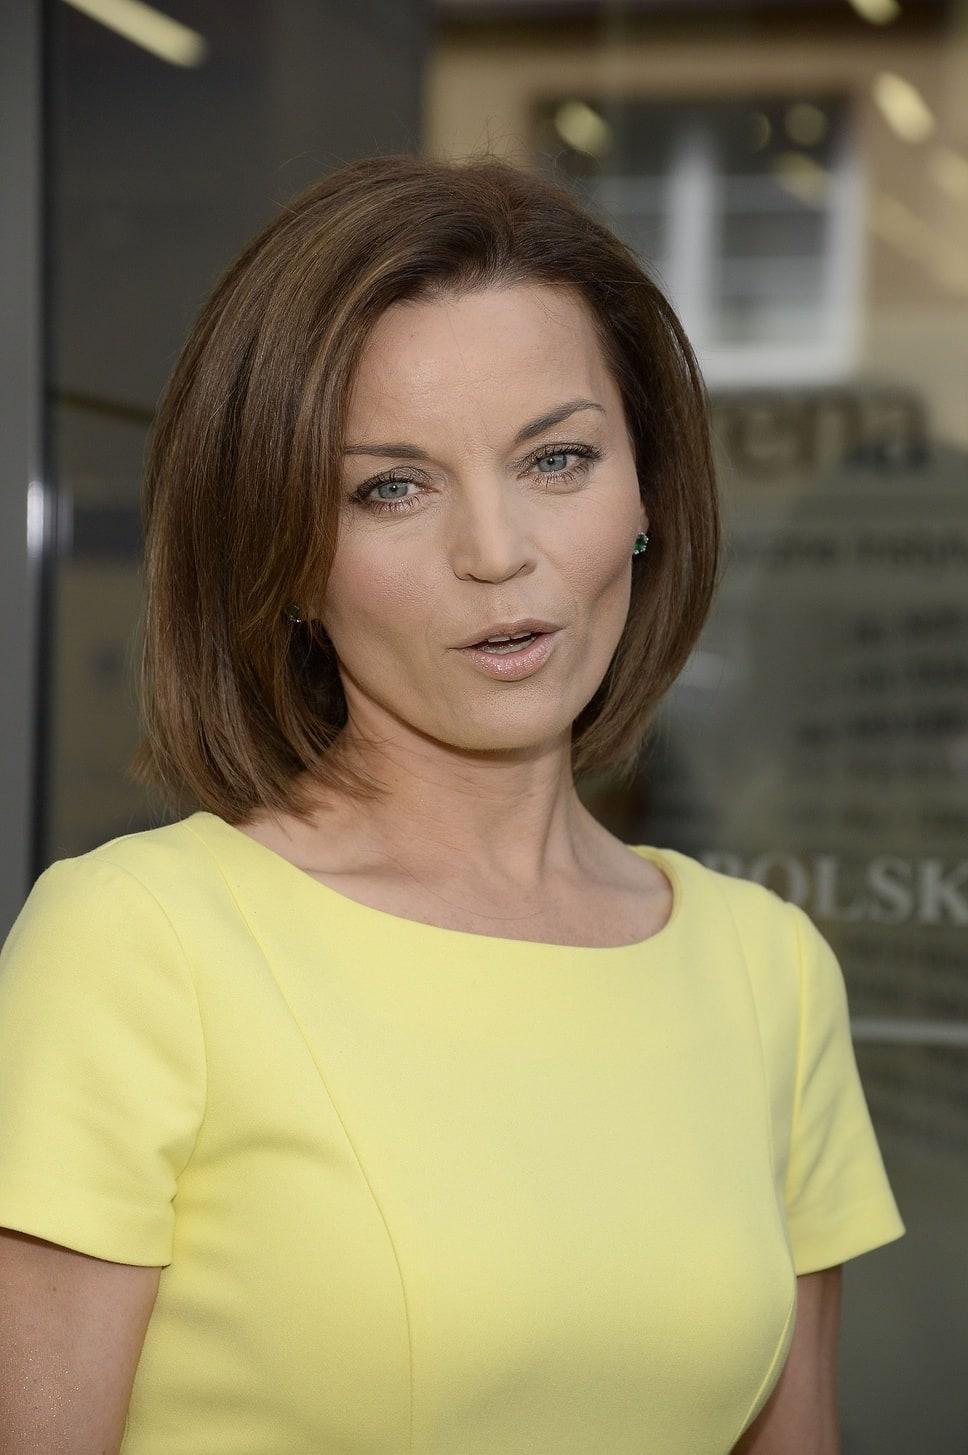 Malgorzata Foremniak